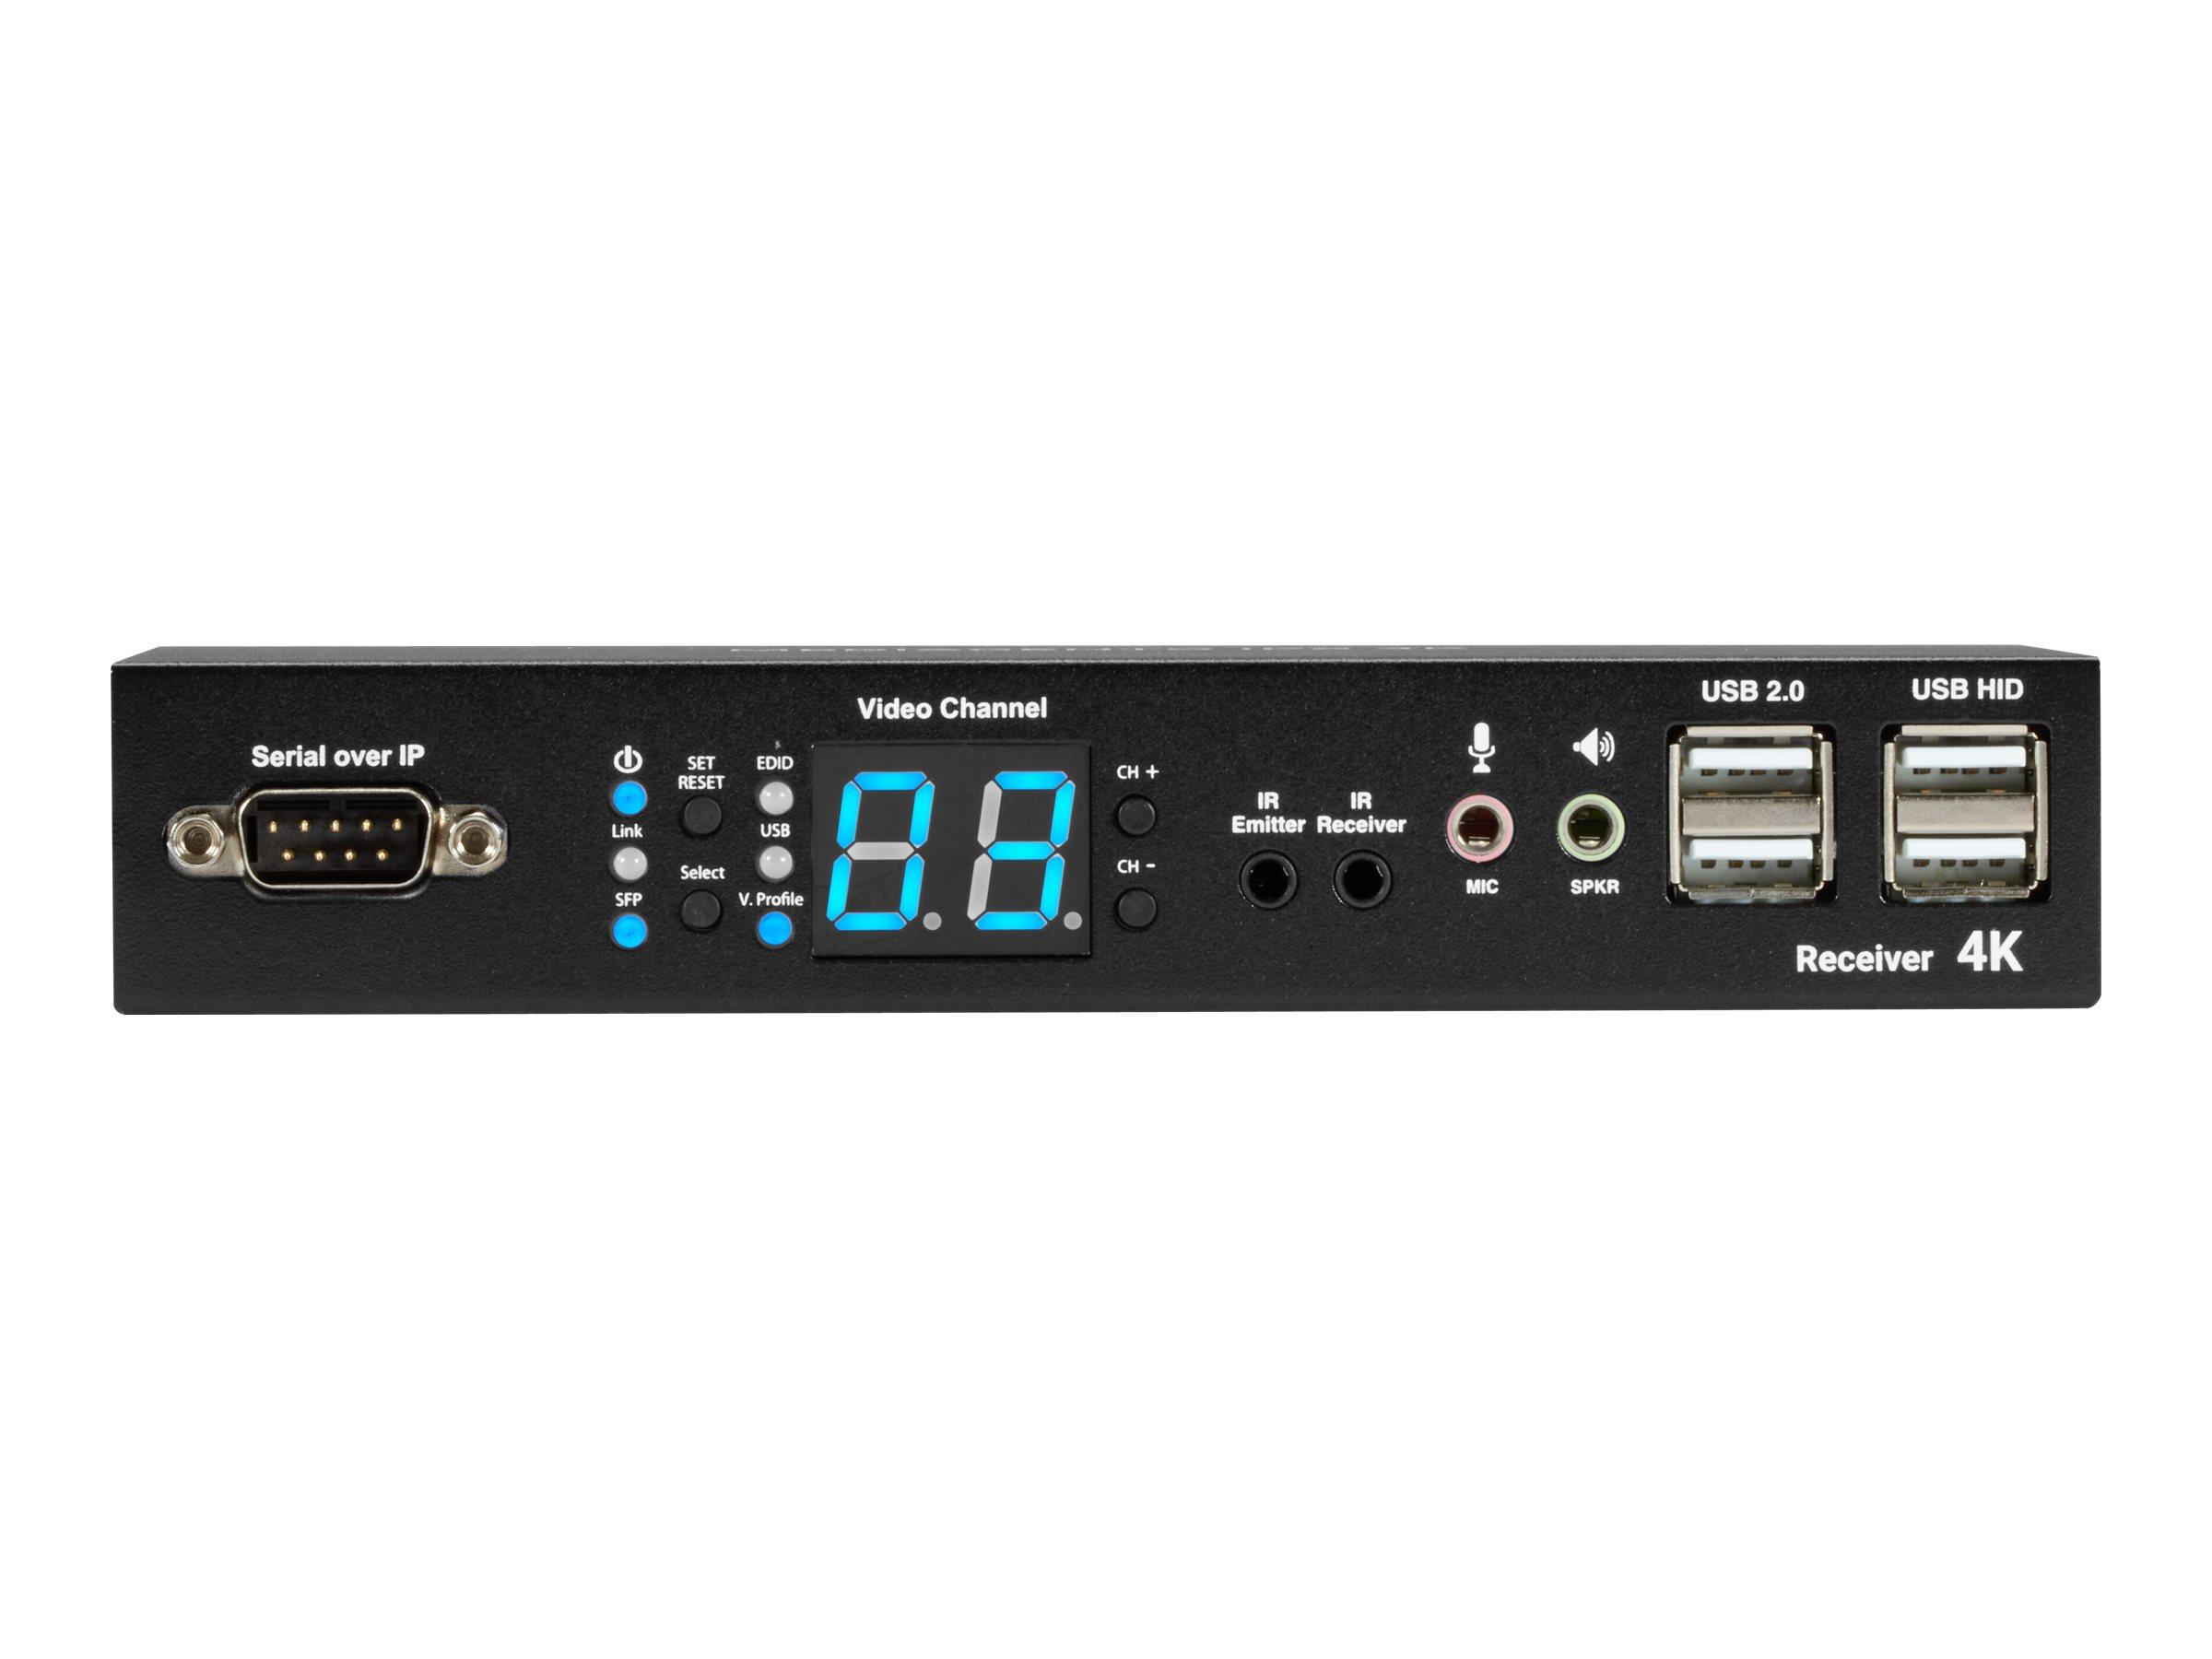 Black Box MediaCento IPX 4K Receiver - Video-/ Audio-/ Infrarot- /USB-/ serielle Erweiterung - GigE, Fibre Channel - USB - Glasf